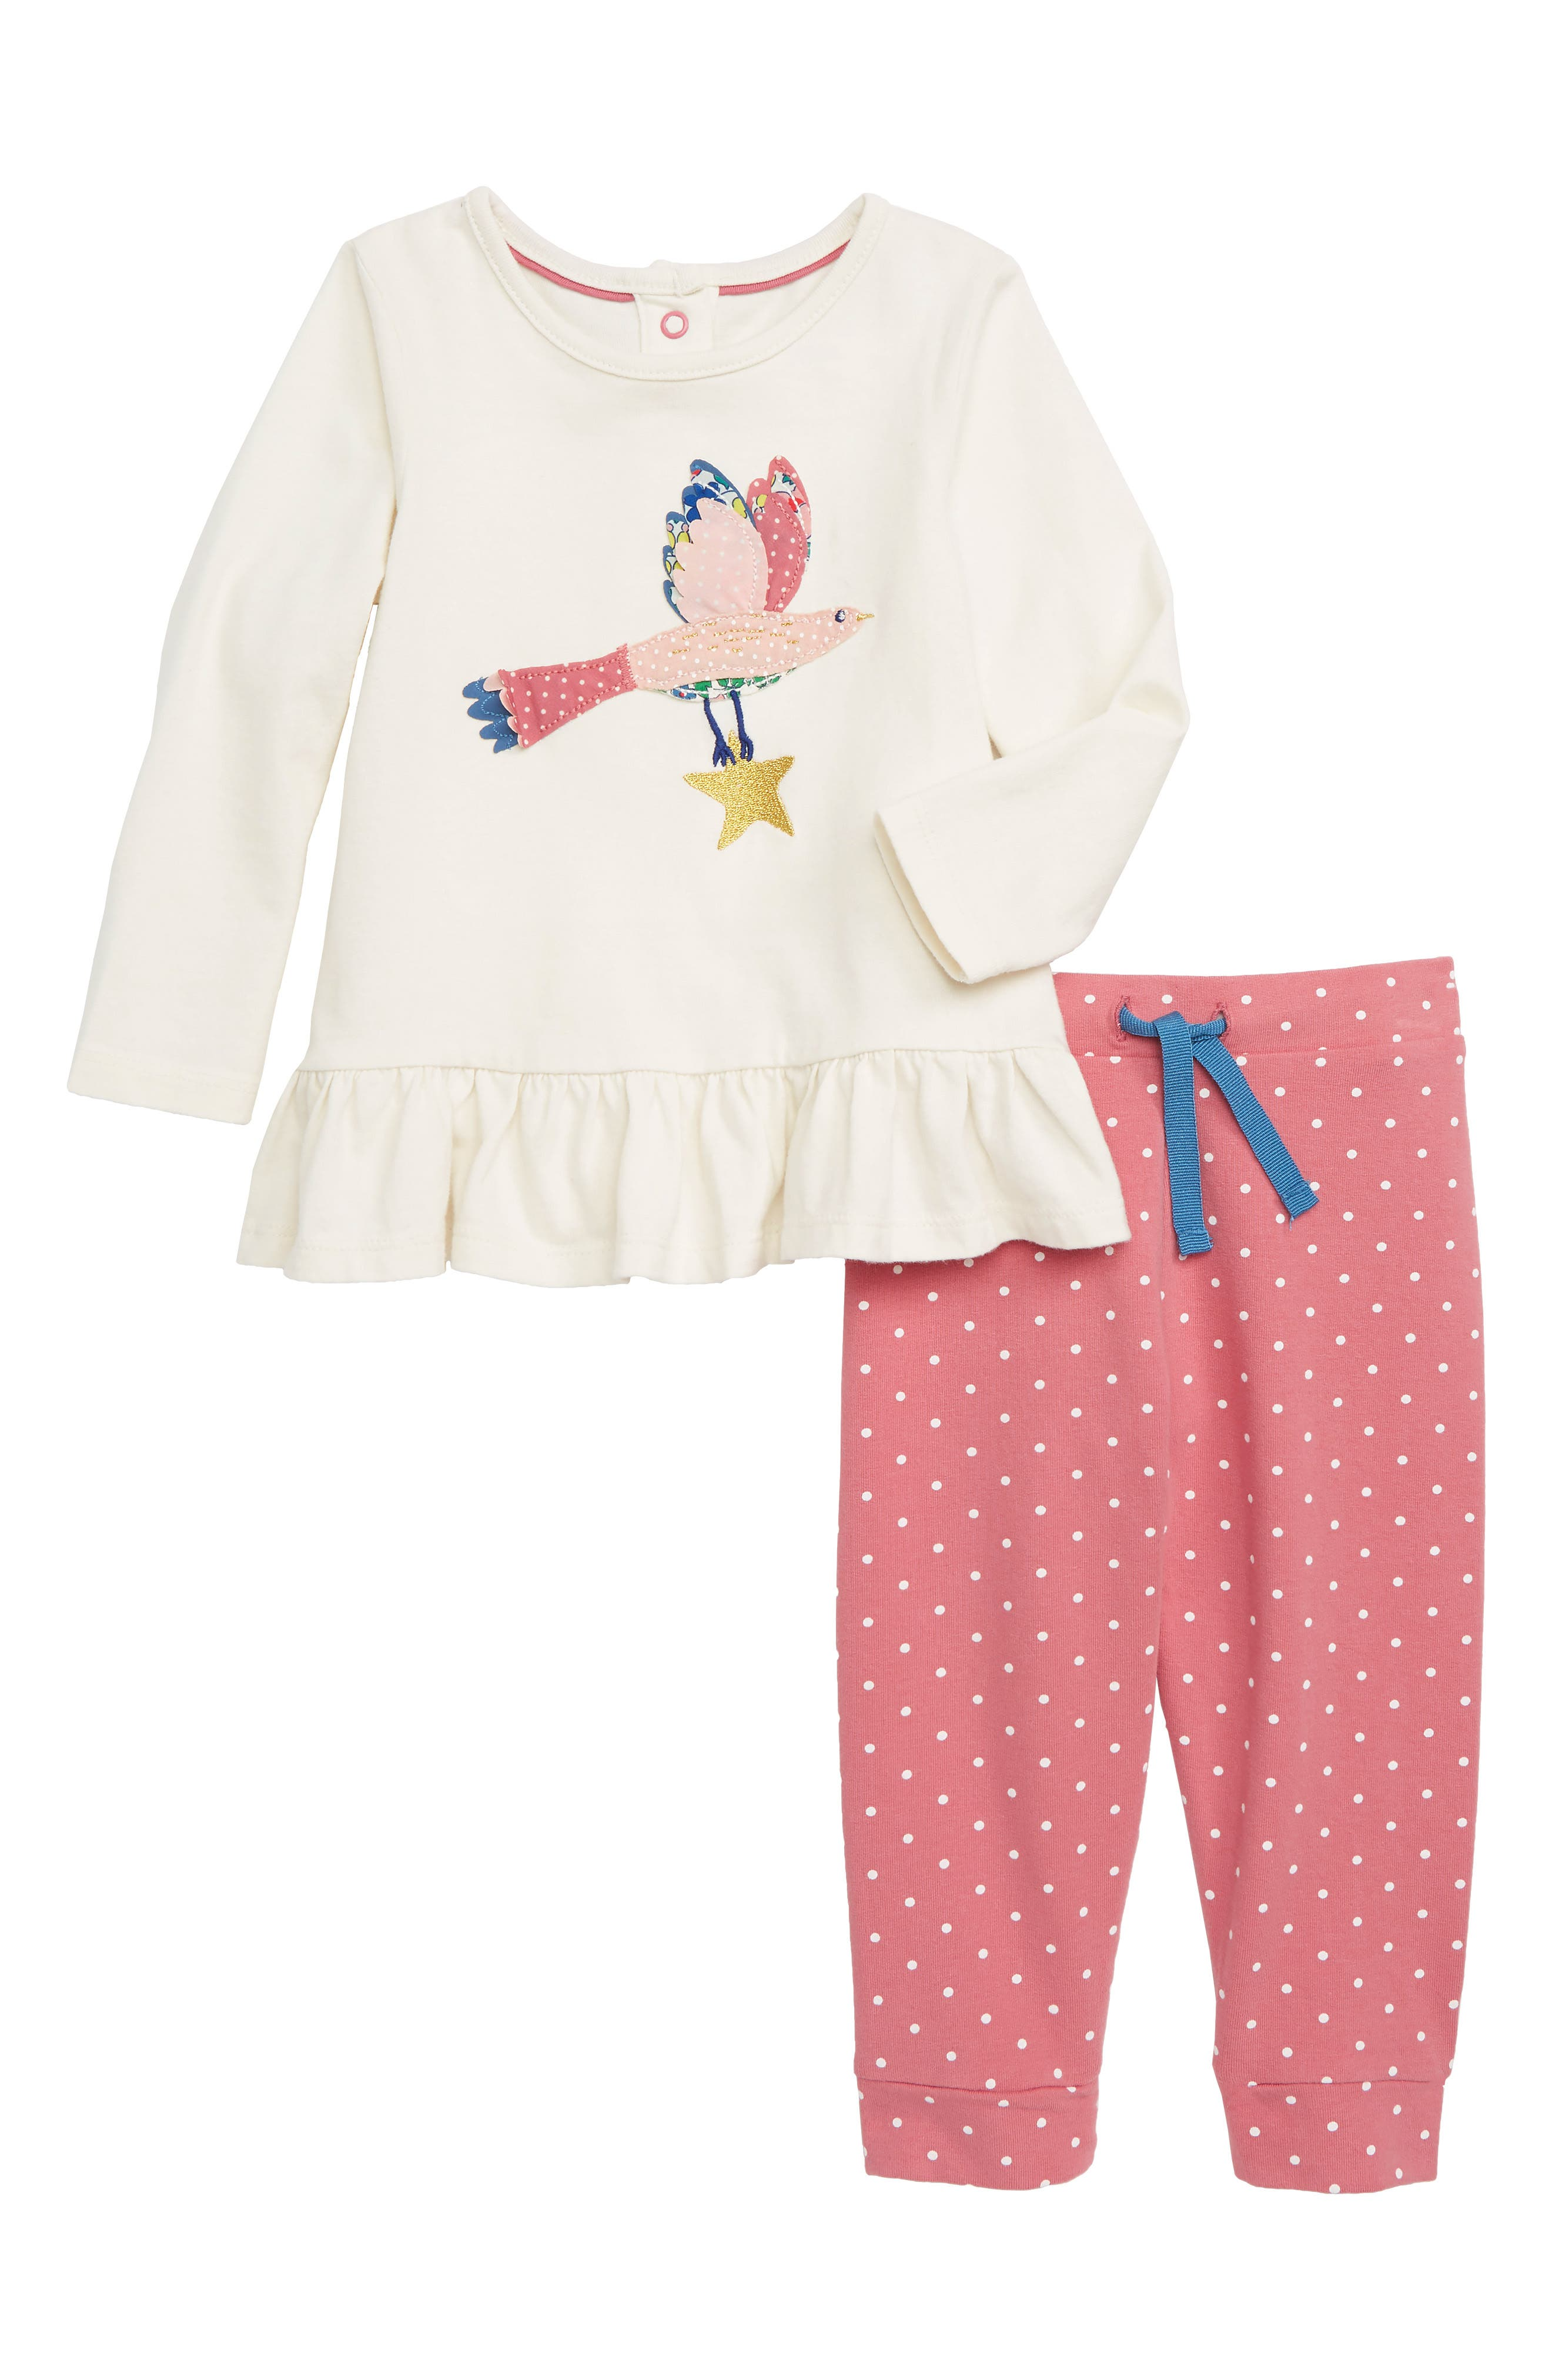 Toddler Girls Mini Boden Magical Applique Tee  Leggings Set